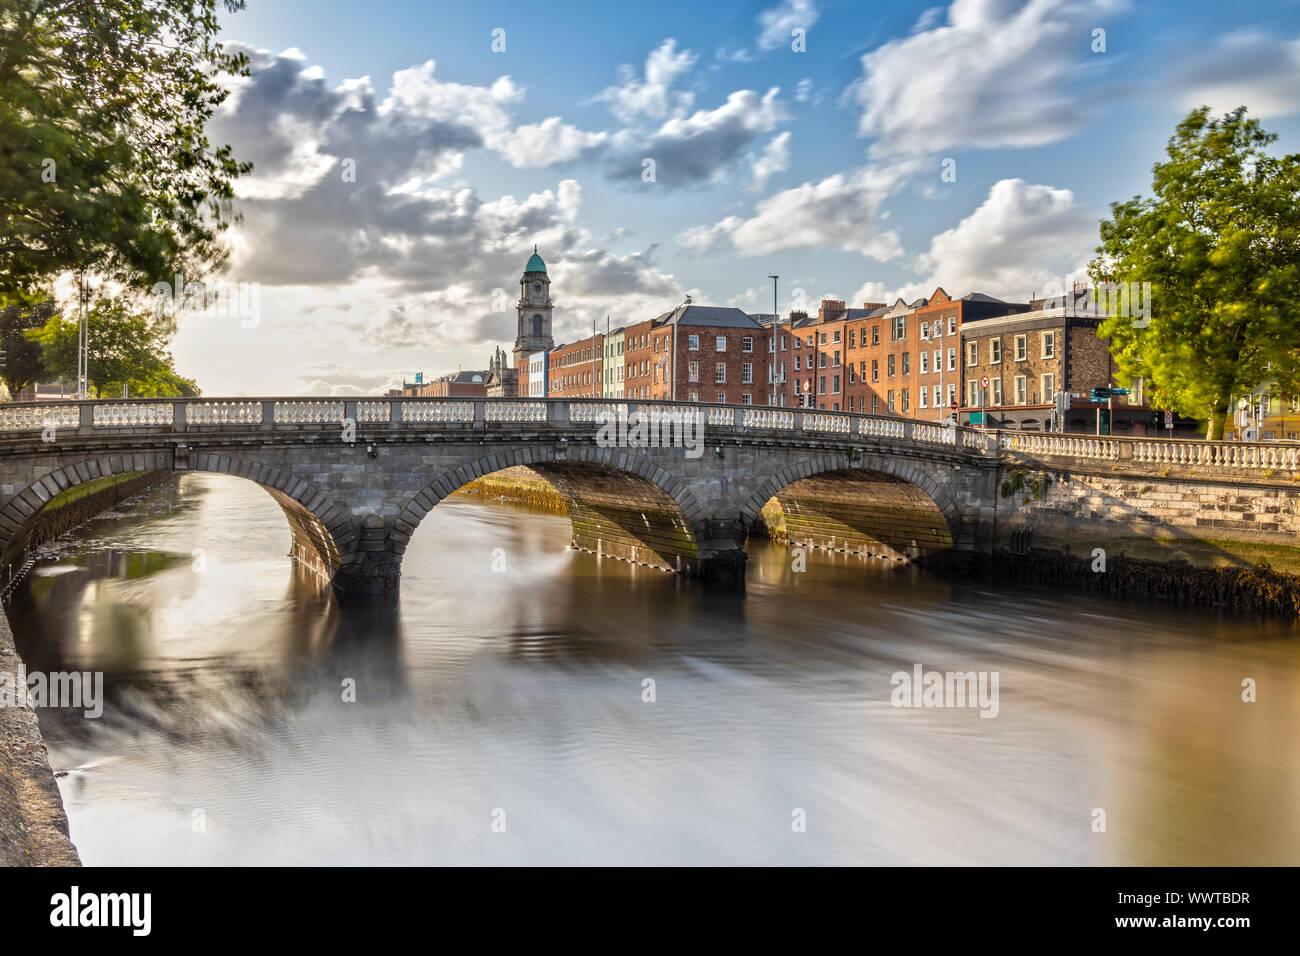 Saint Paul's Church and the River Liffey in Dublin, Ireland Stock Photo